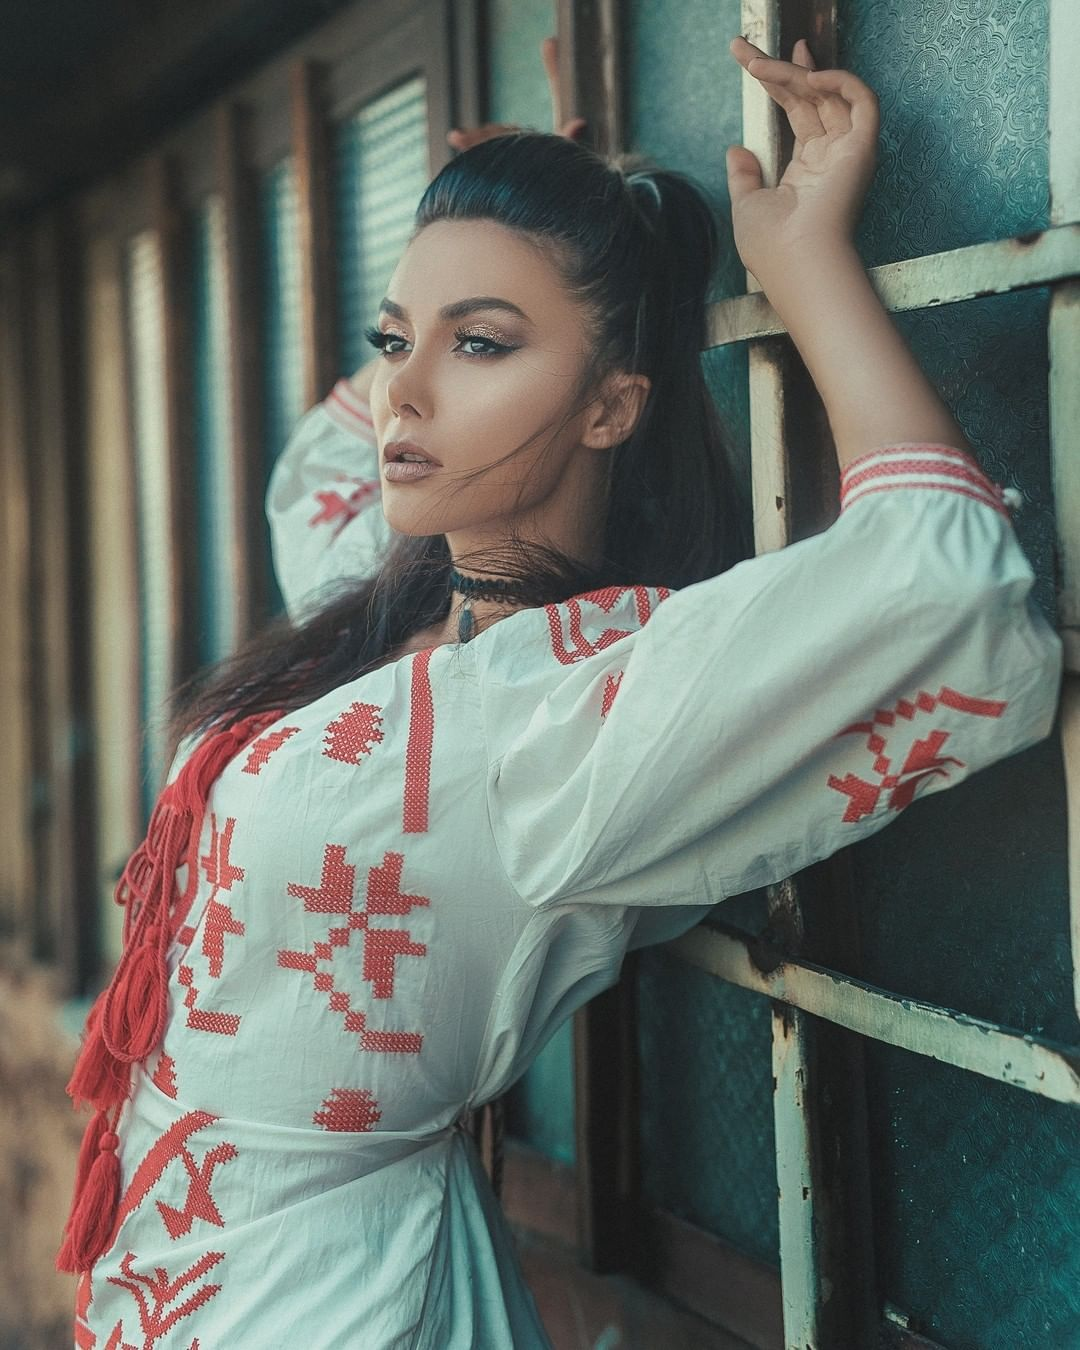 #fashion #portrait #people #wear #street #model #pretty #one #girl #competition #graffiti #outdoors #festival #love #glamour #ey